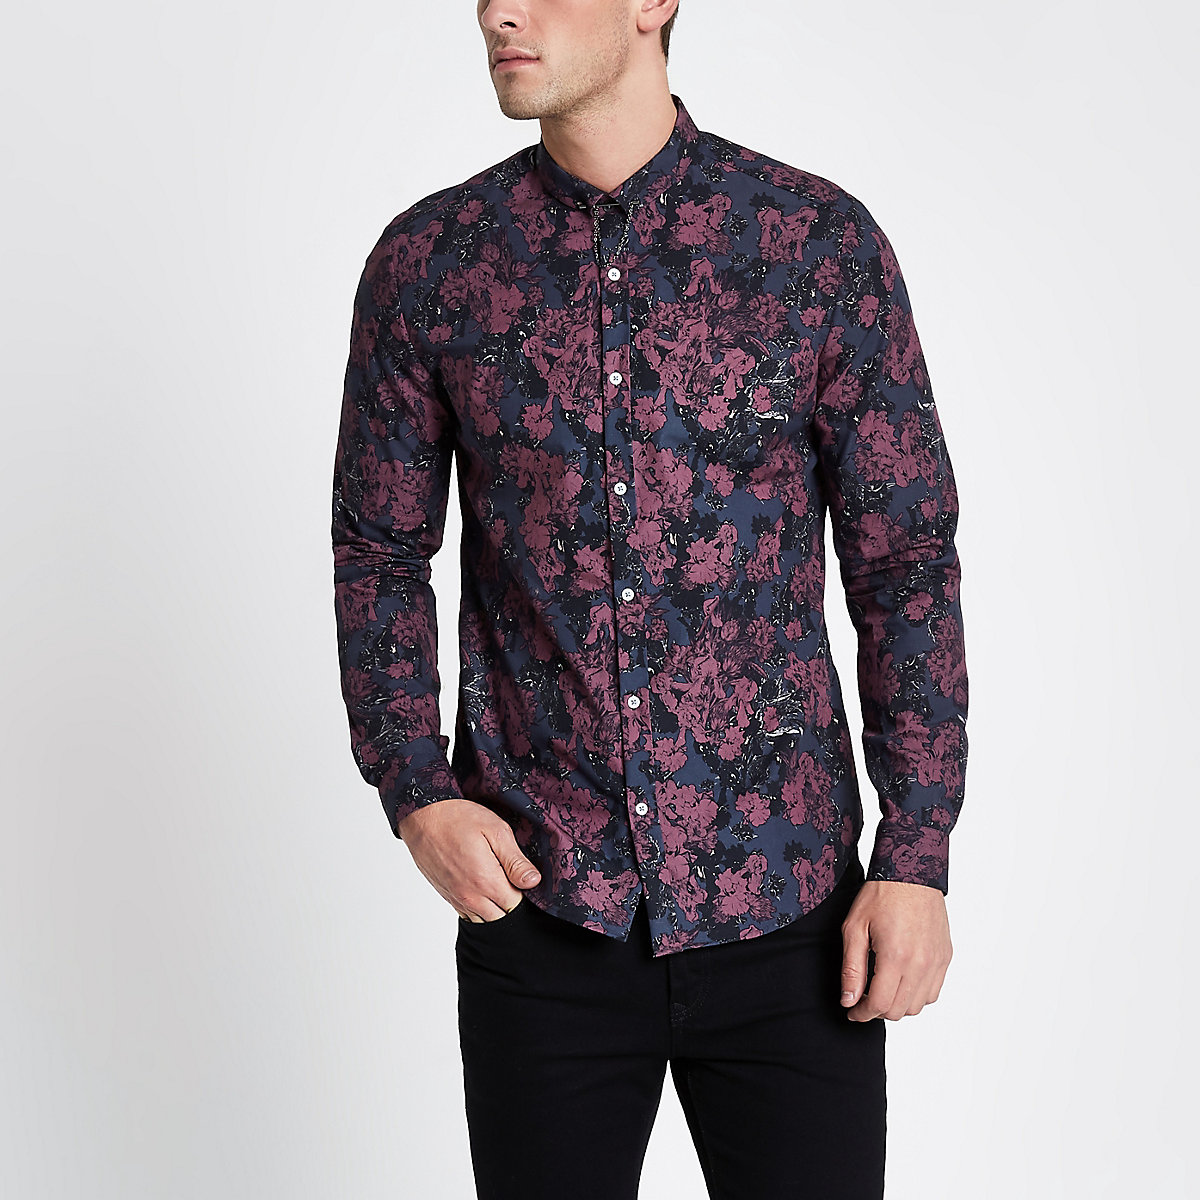 Burgundy floral long sleeve slim fit shirt